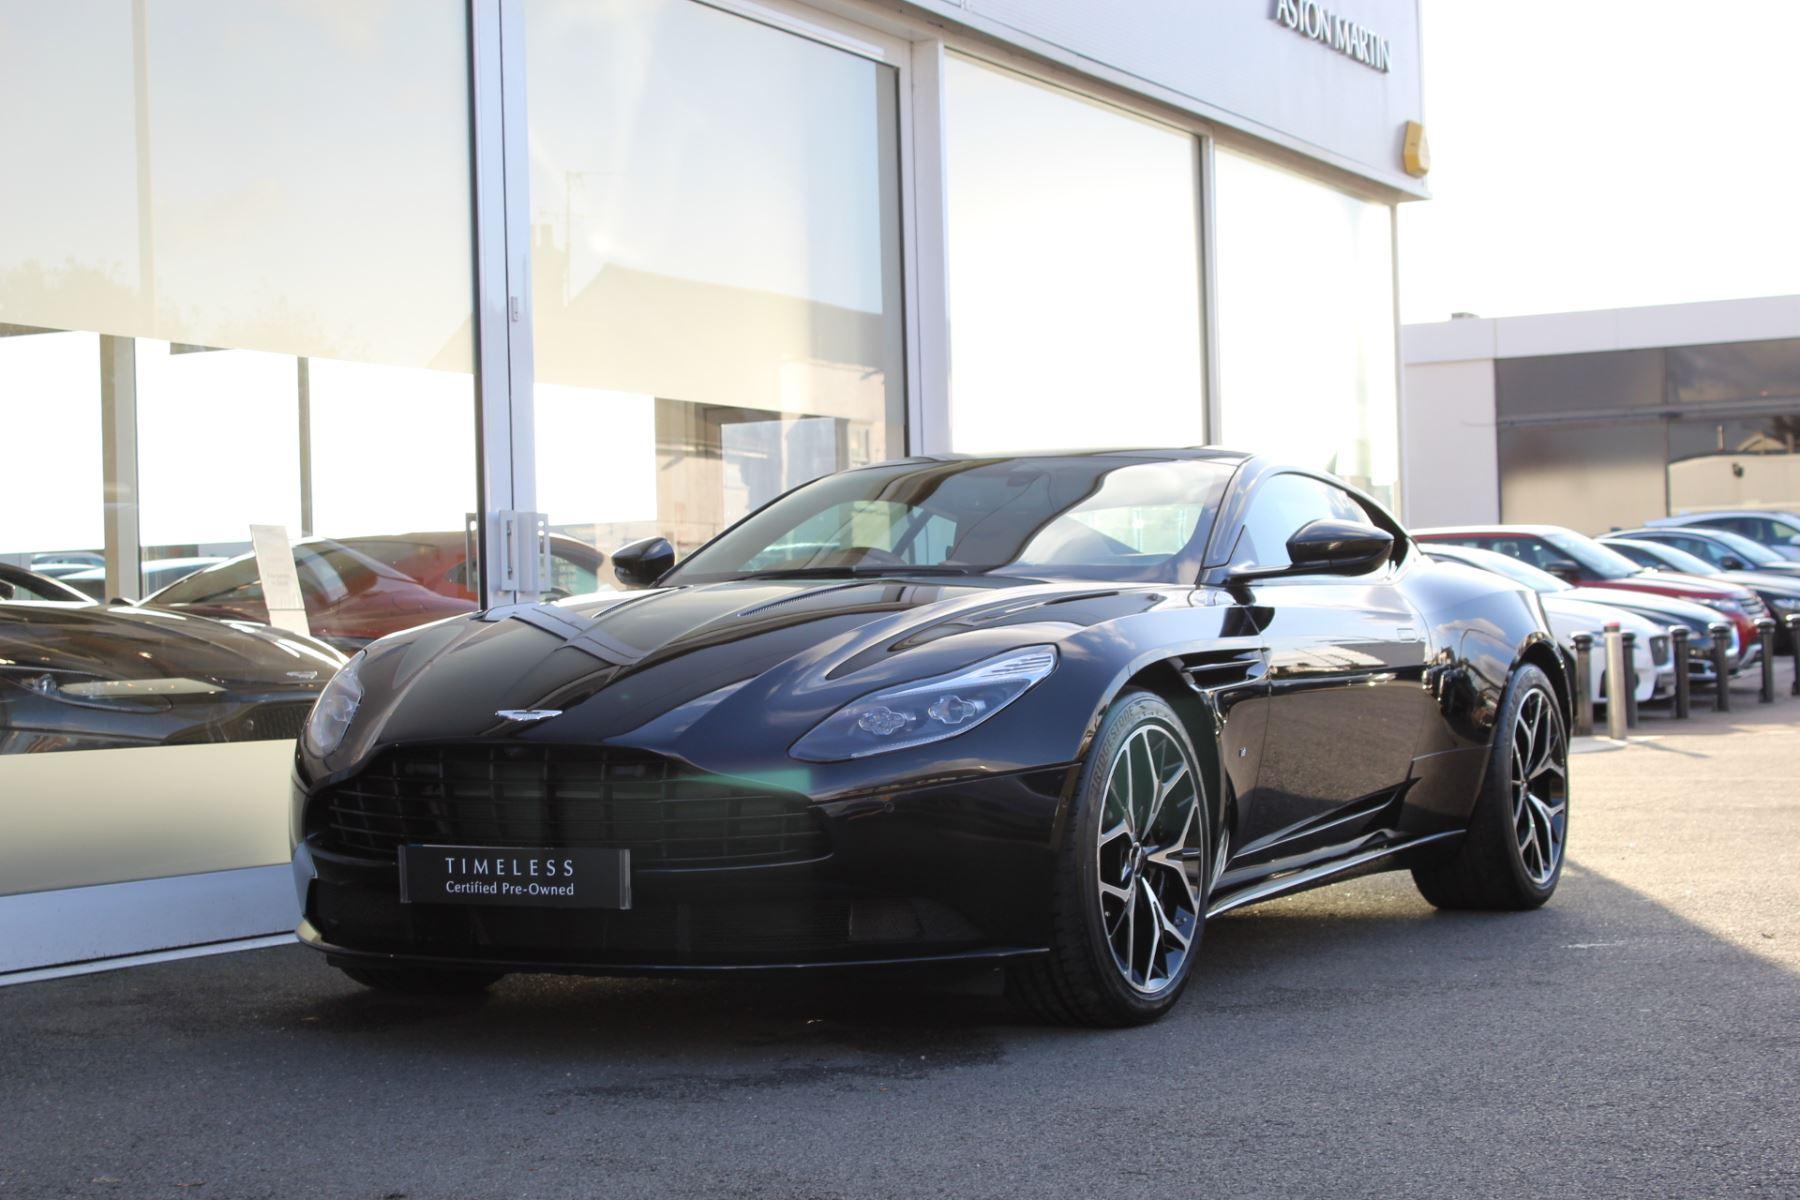 Aston Martin DB11 V12 2dr Touchtronic image 5